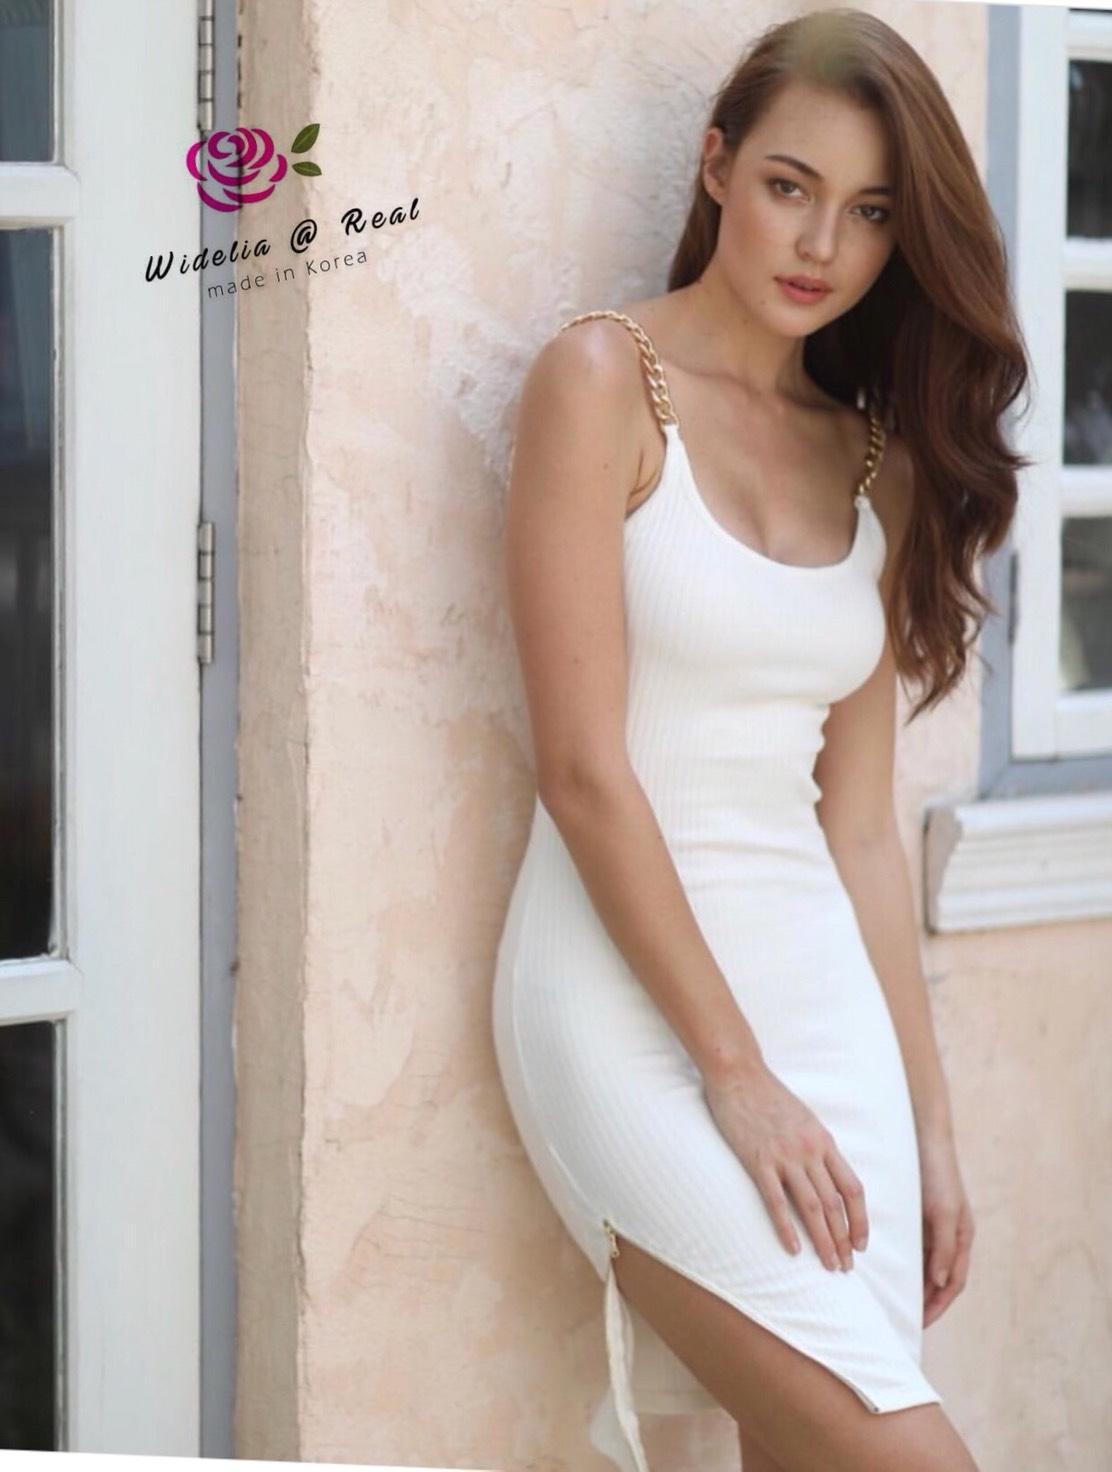 Dress เดรสสายเดี่ยว ตัวนี้แซ่บและสวยมาก